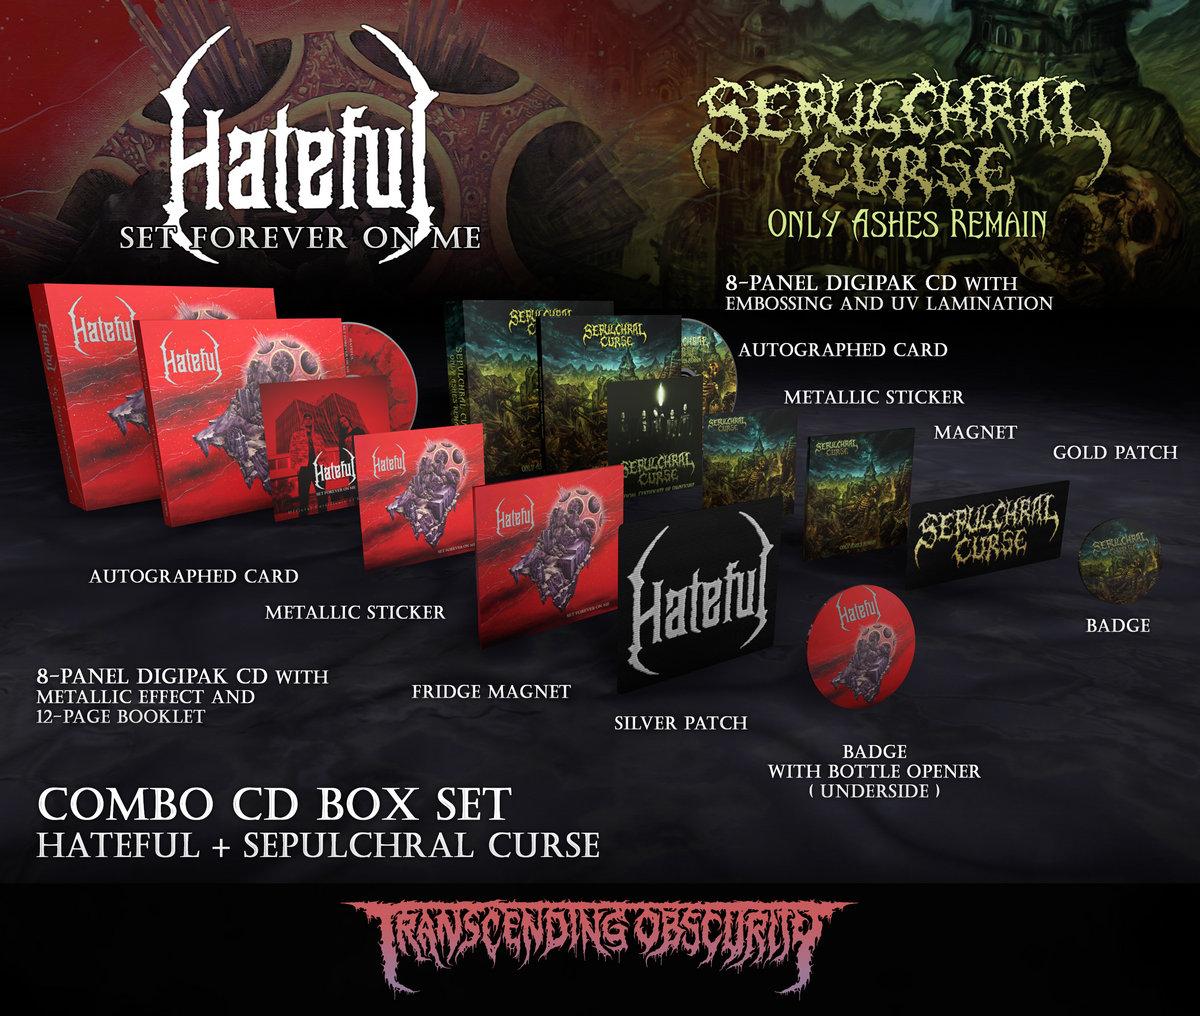 HATEFUL + SEPULCHRAL CURSE Autographed CD Box Set Combo